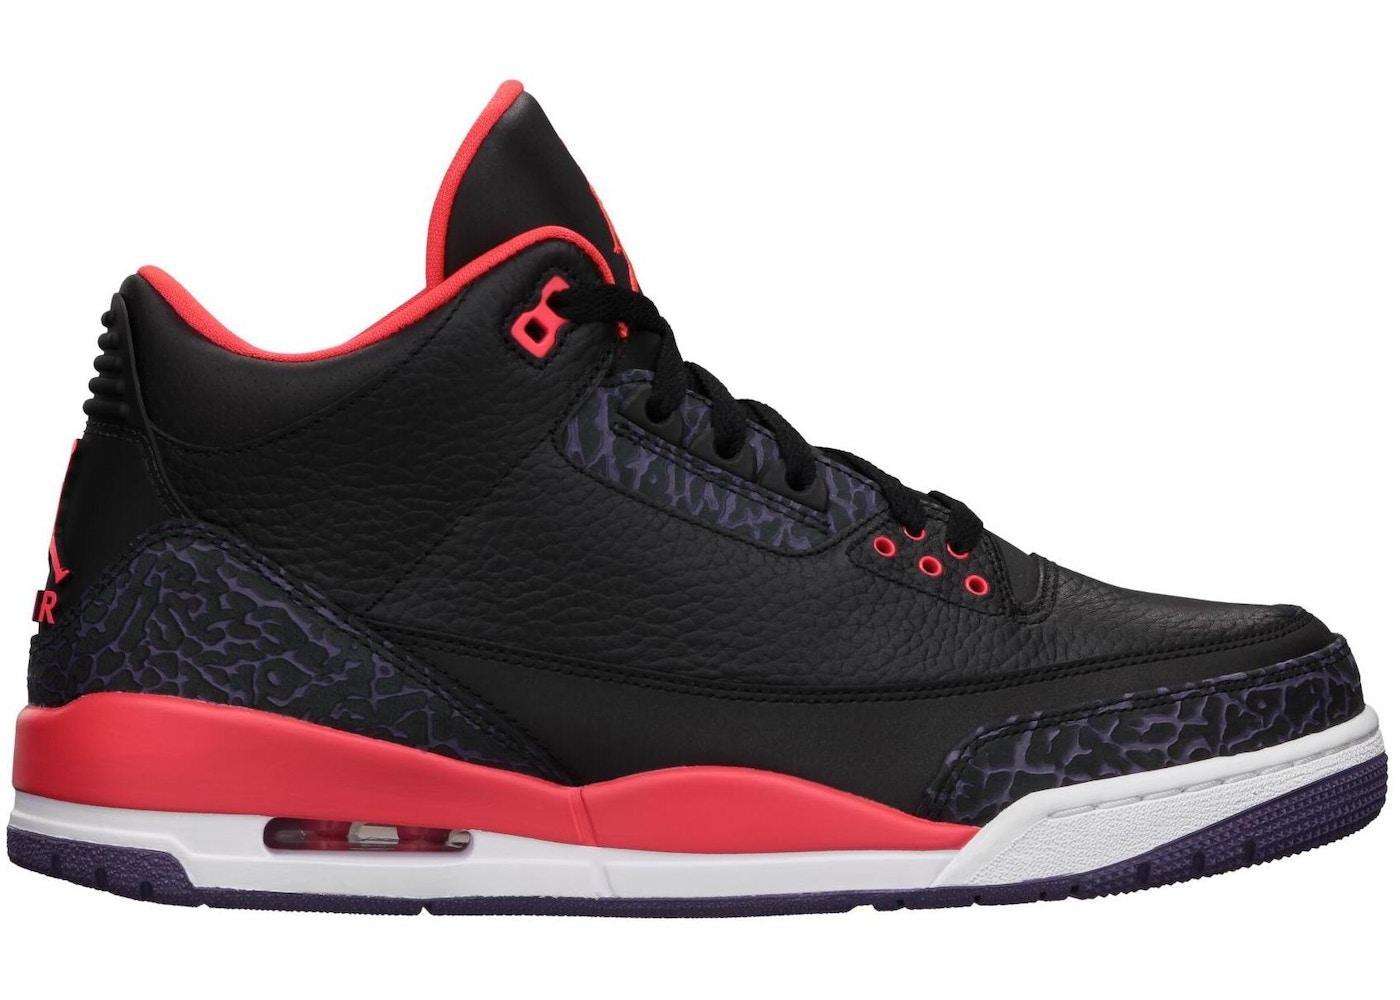 new styles e0d87 501f8 Jordan 3 Retro Crimson